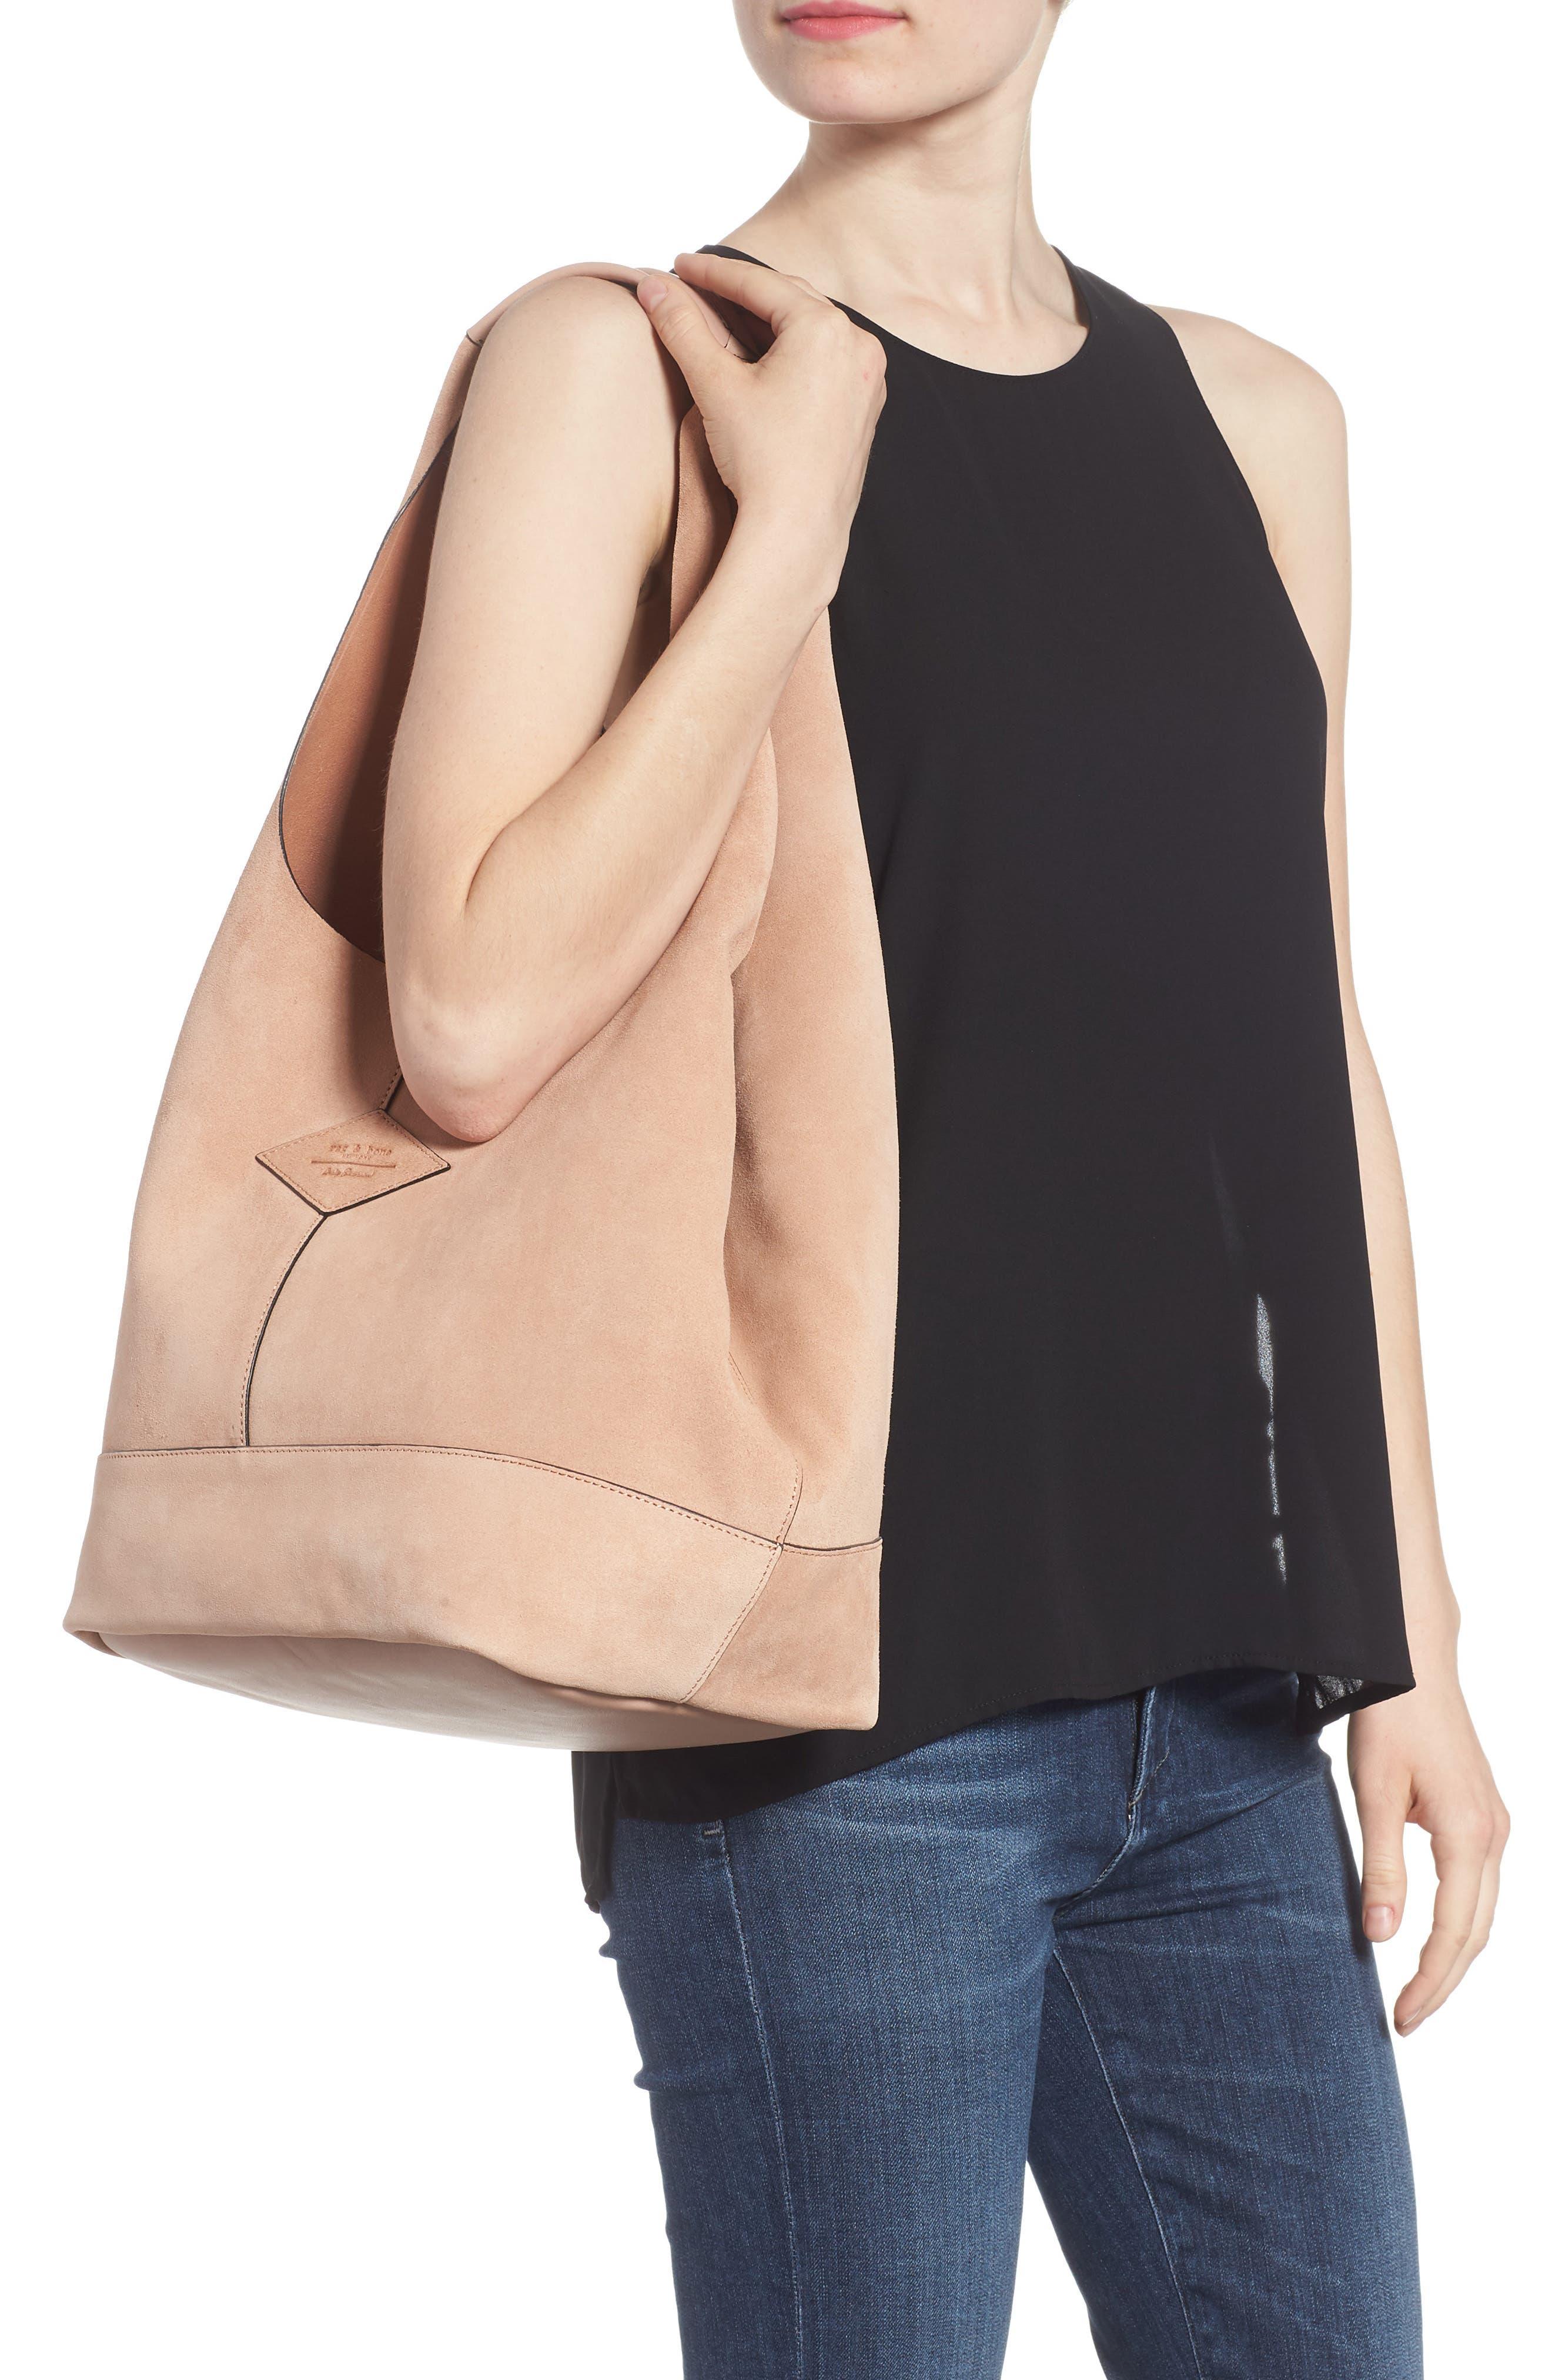 Camden Shopper Bag,                             Alternate thumbnail 2, color,                             253